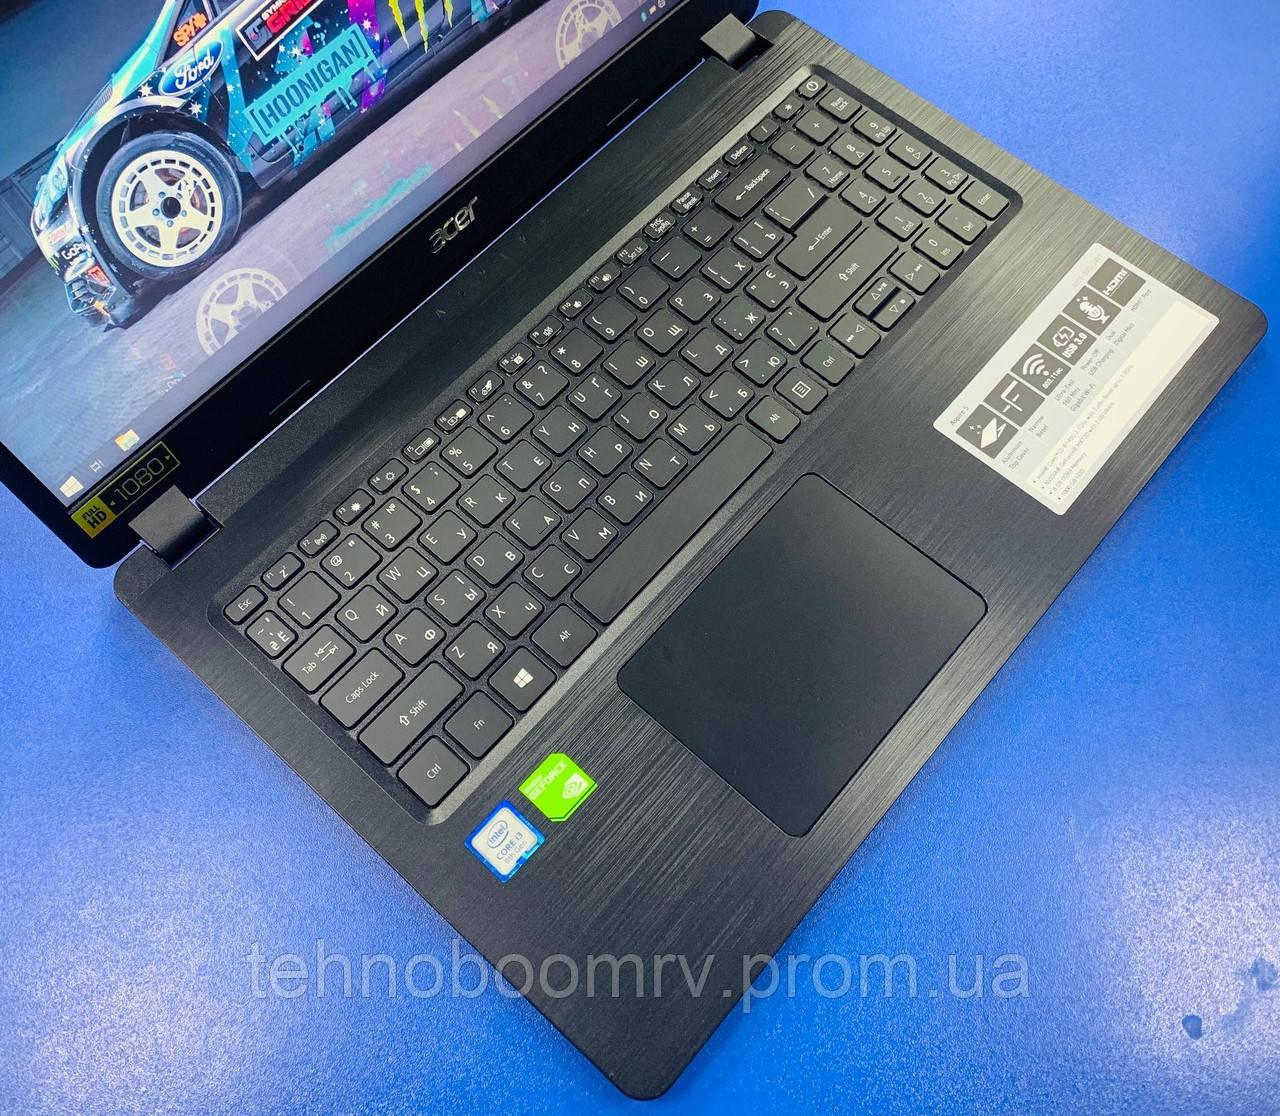 Нульцевый/FHD/Intel i3-8145U 3.9/DDR4 8GB/SSD+HDD/Карта MX130 2GBНет в наличии 2